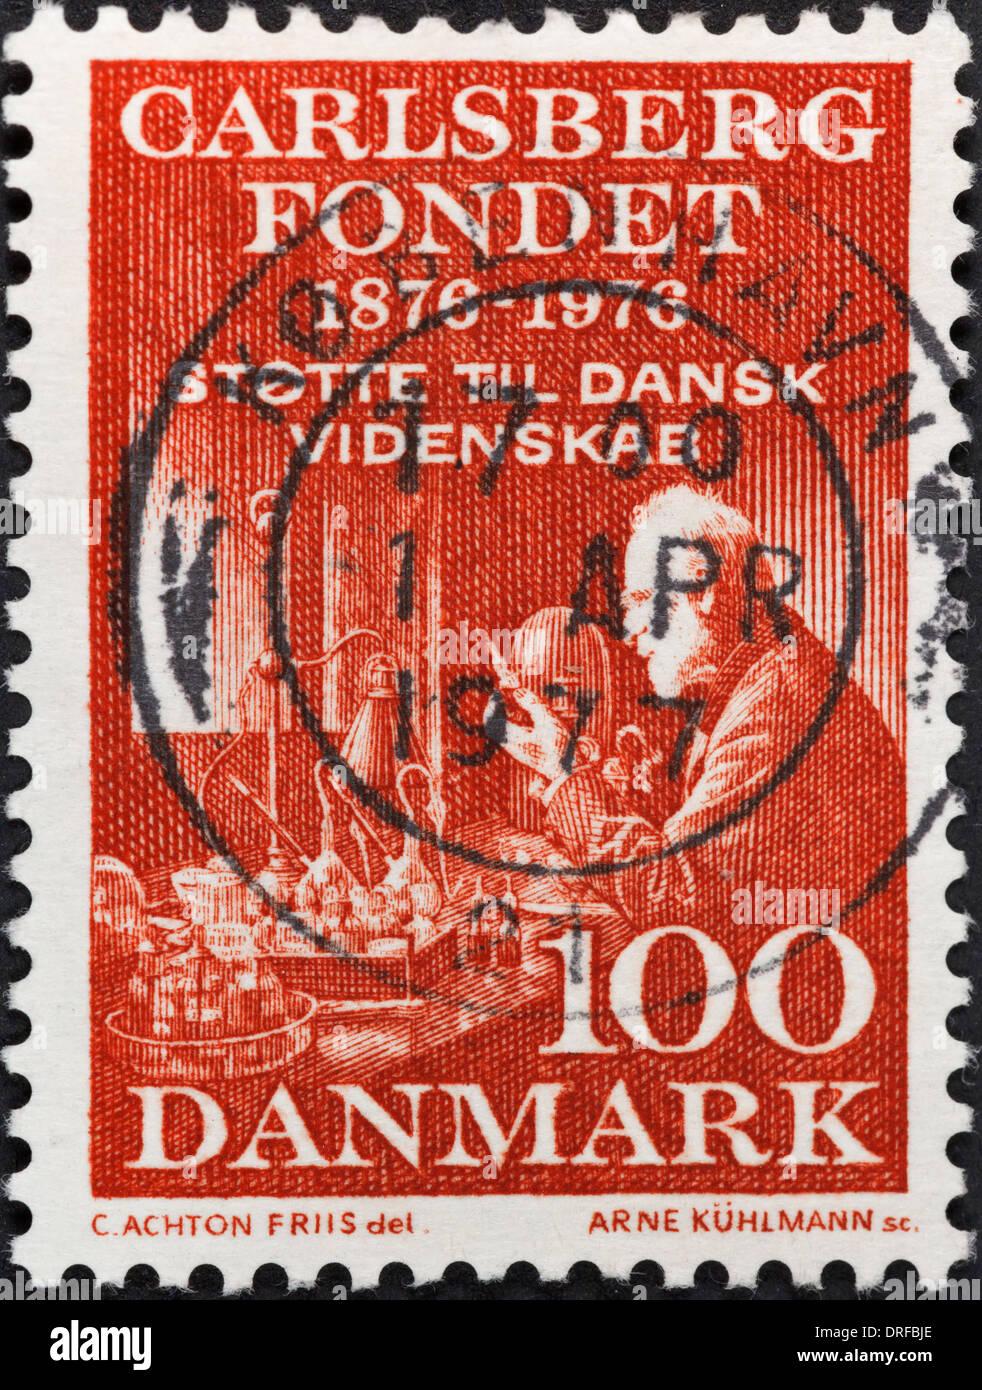 postage stamp - Stock Image